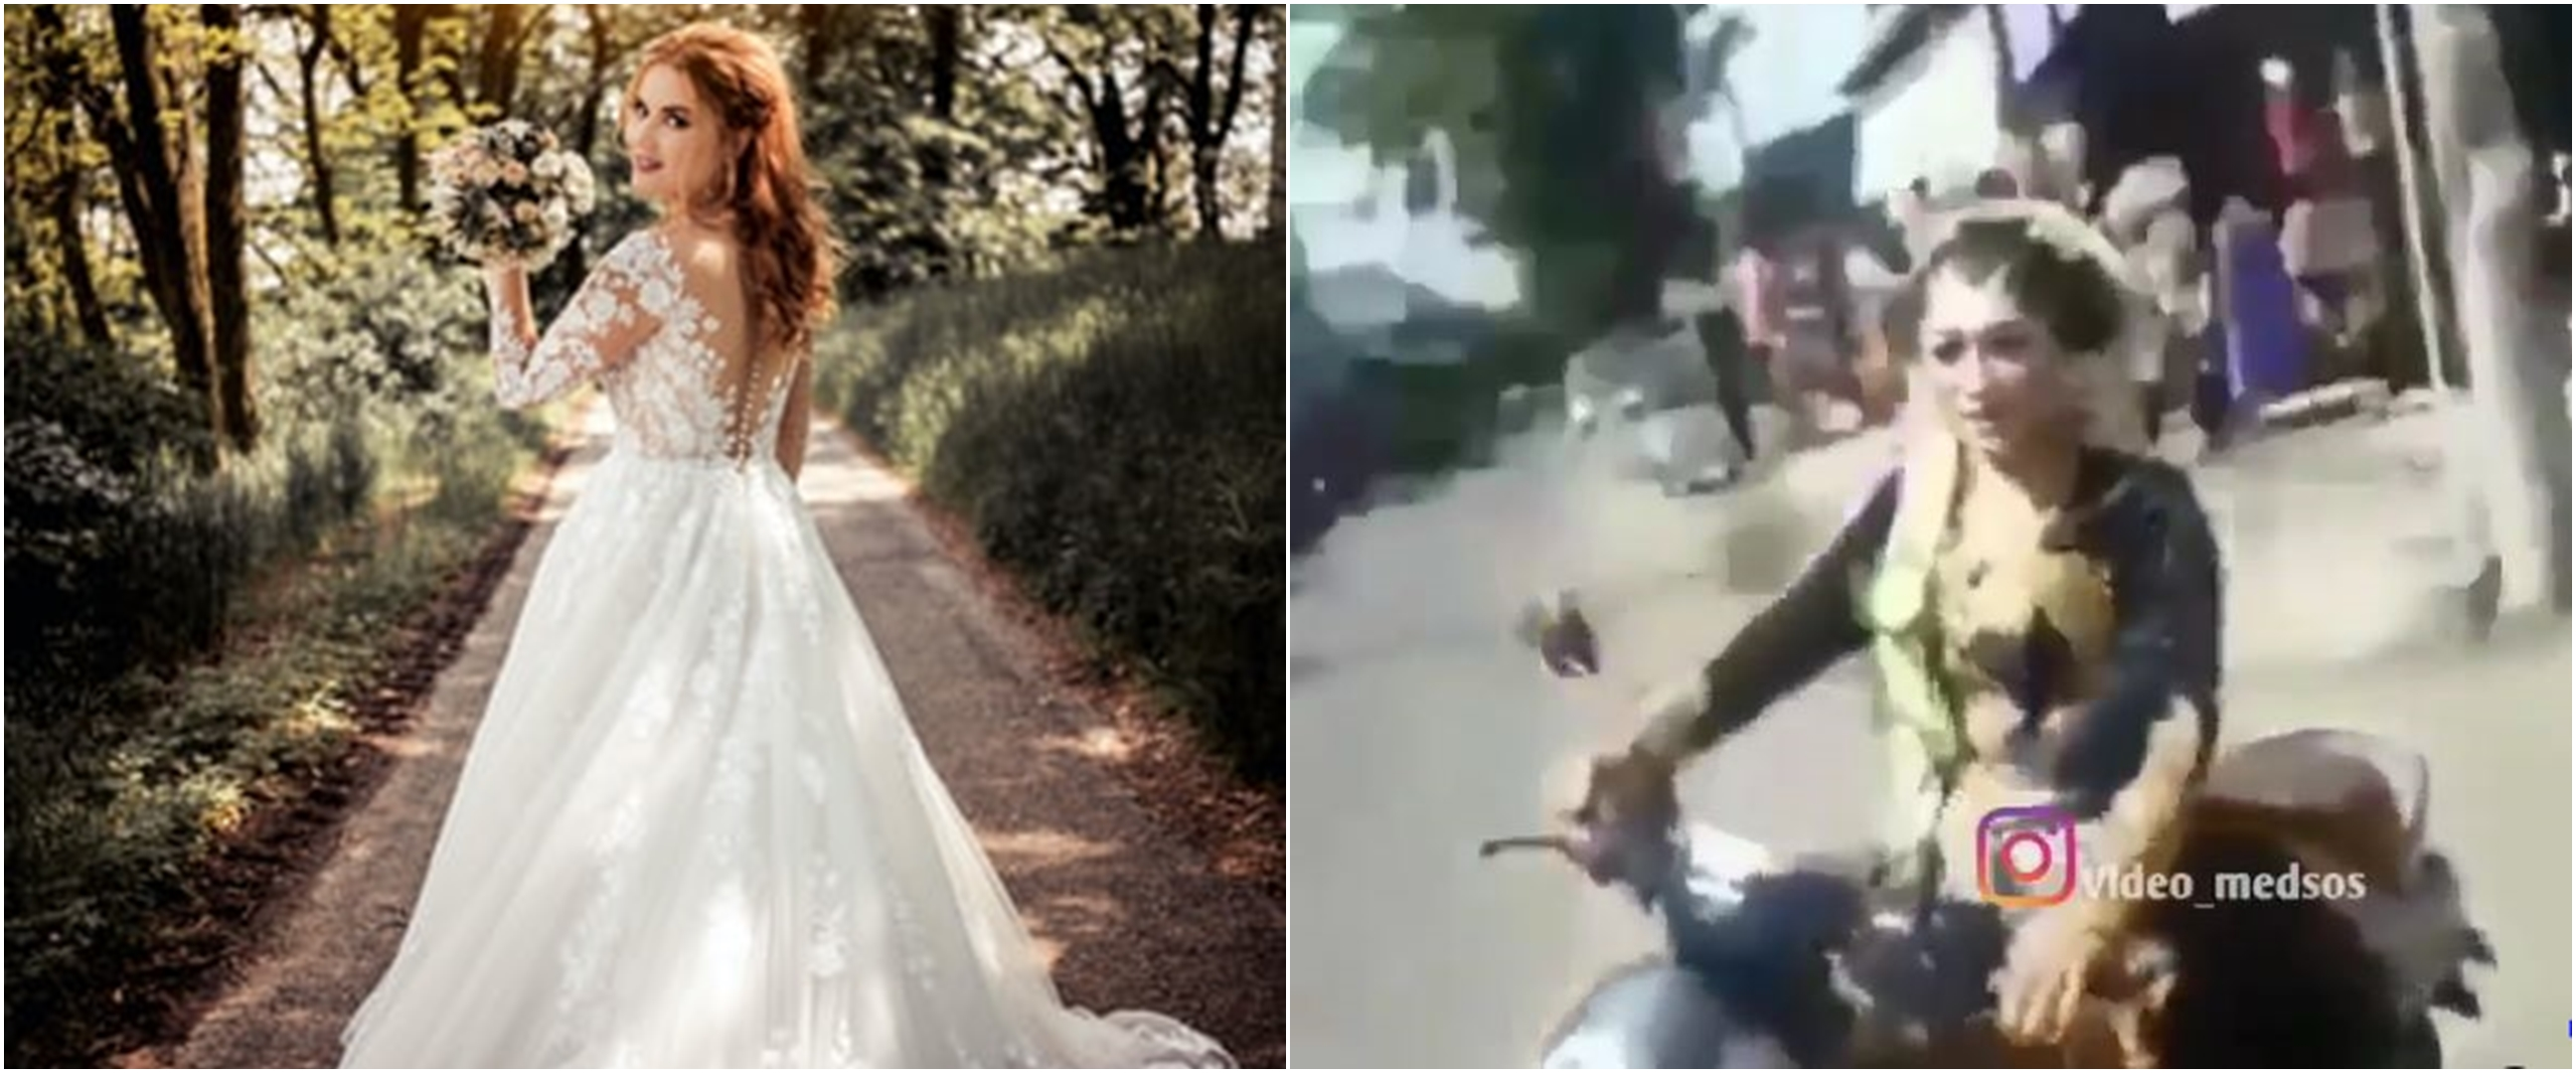 Viral aksi wanita kenakan busana pengantin sambil kendarai motor